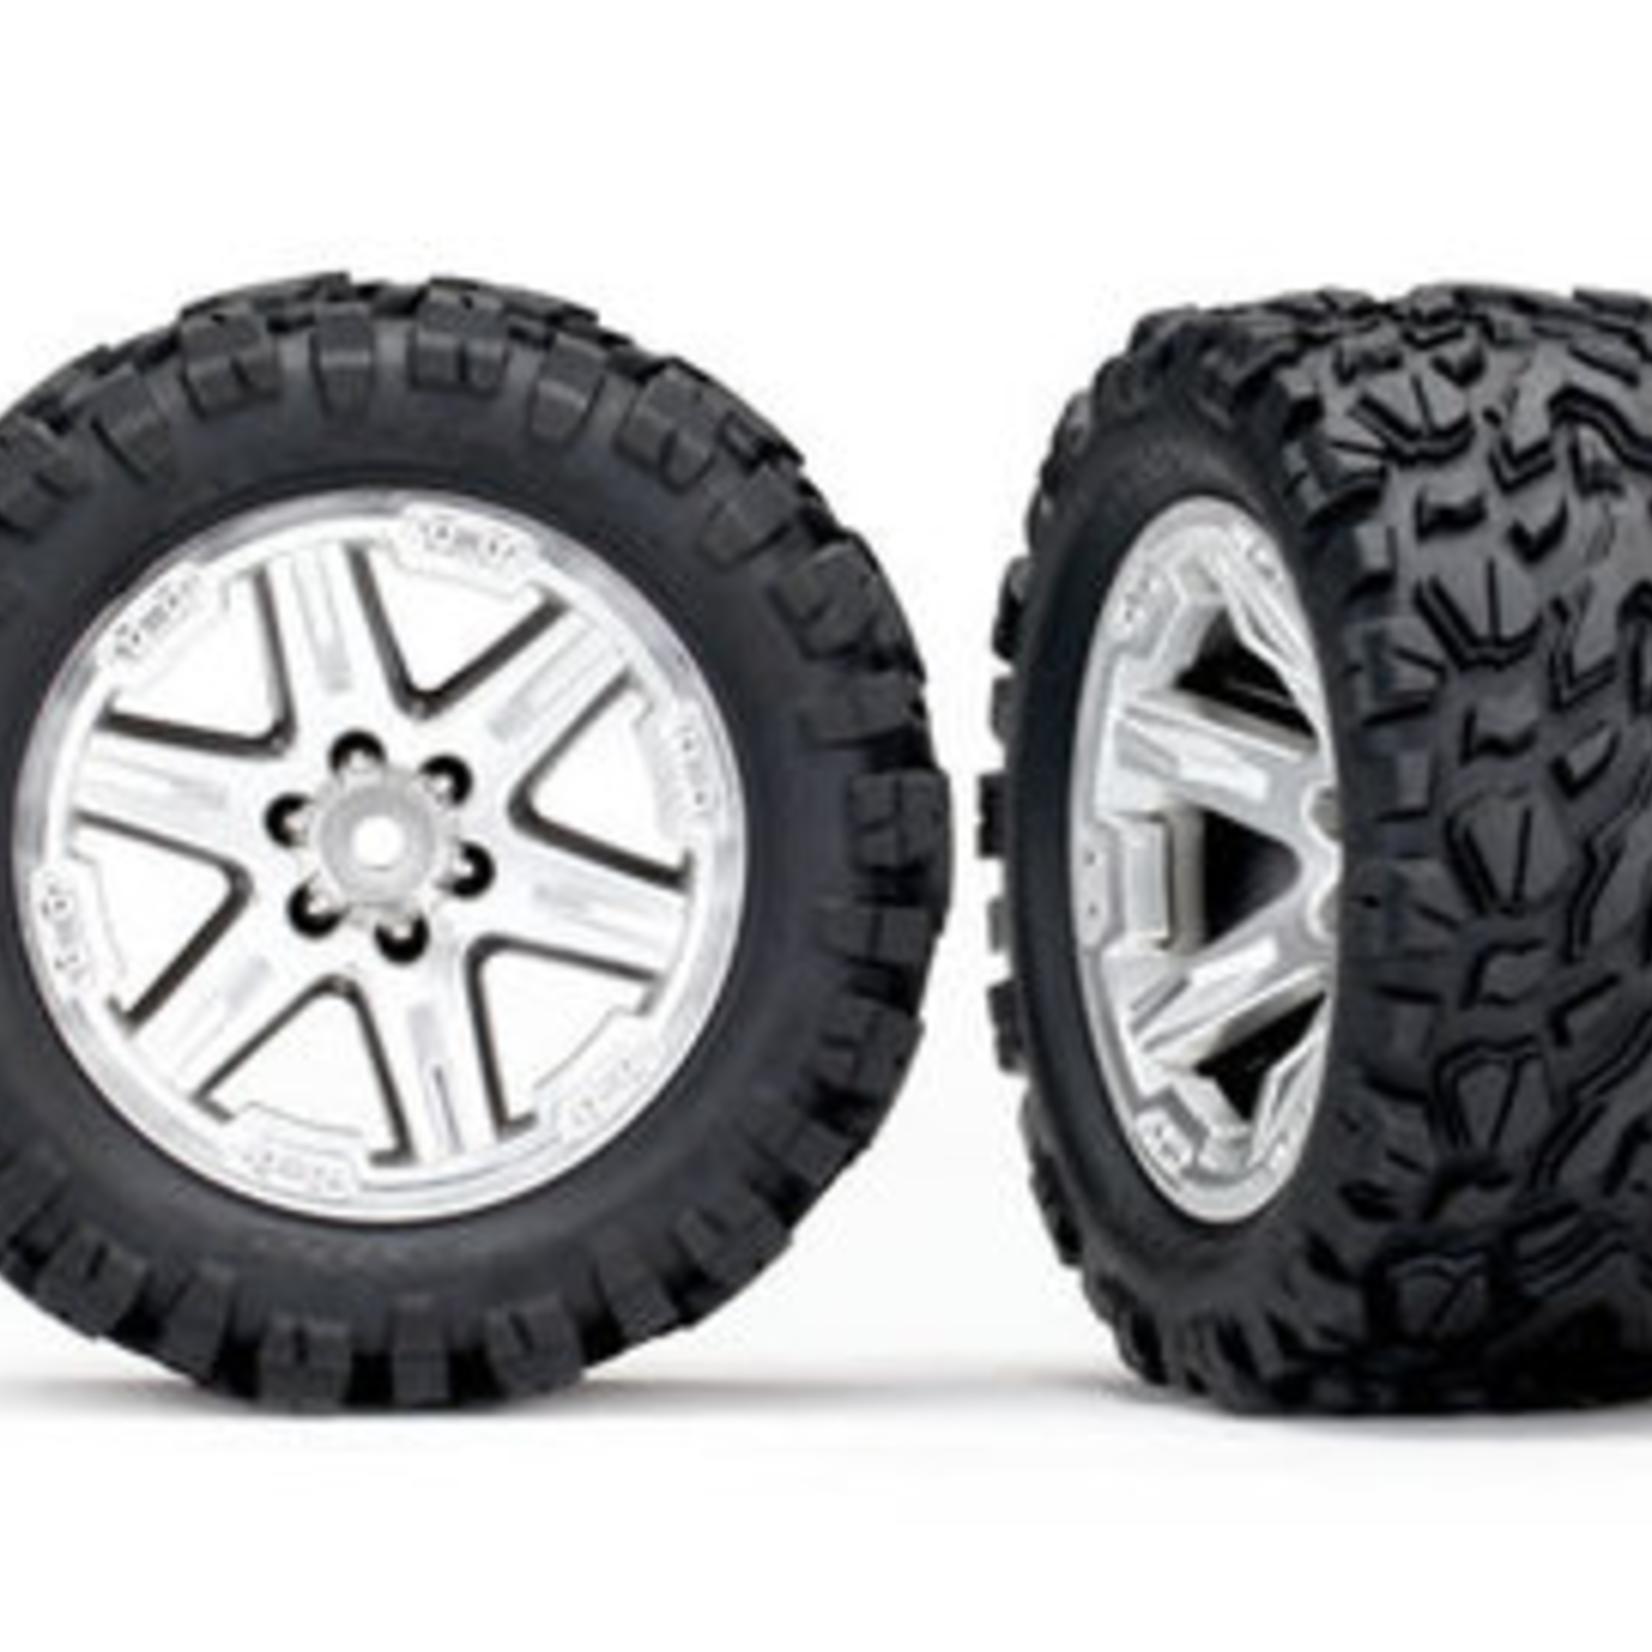 ARRMA ARA550069 Arrma dBoots 'Fortress' Tyre Set Glued Gun Metal (Pair)